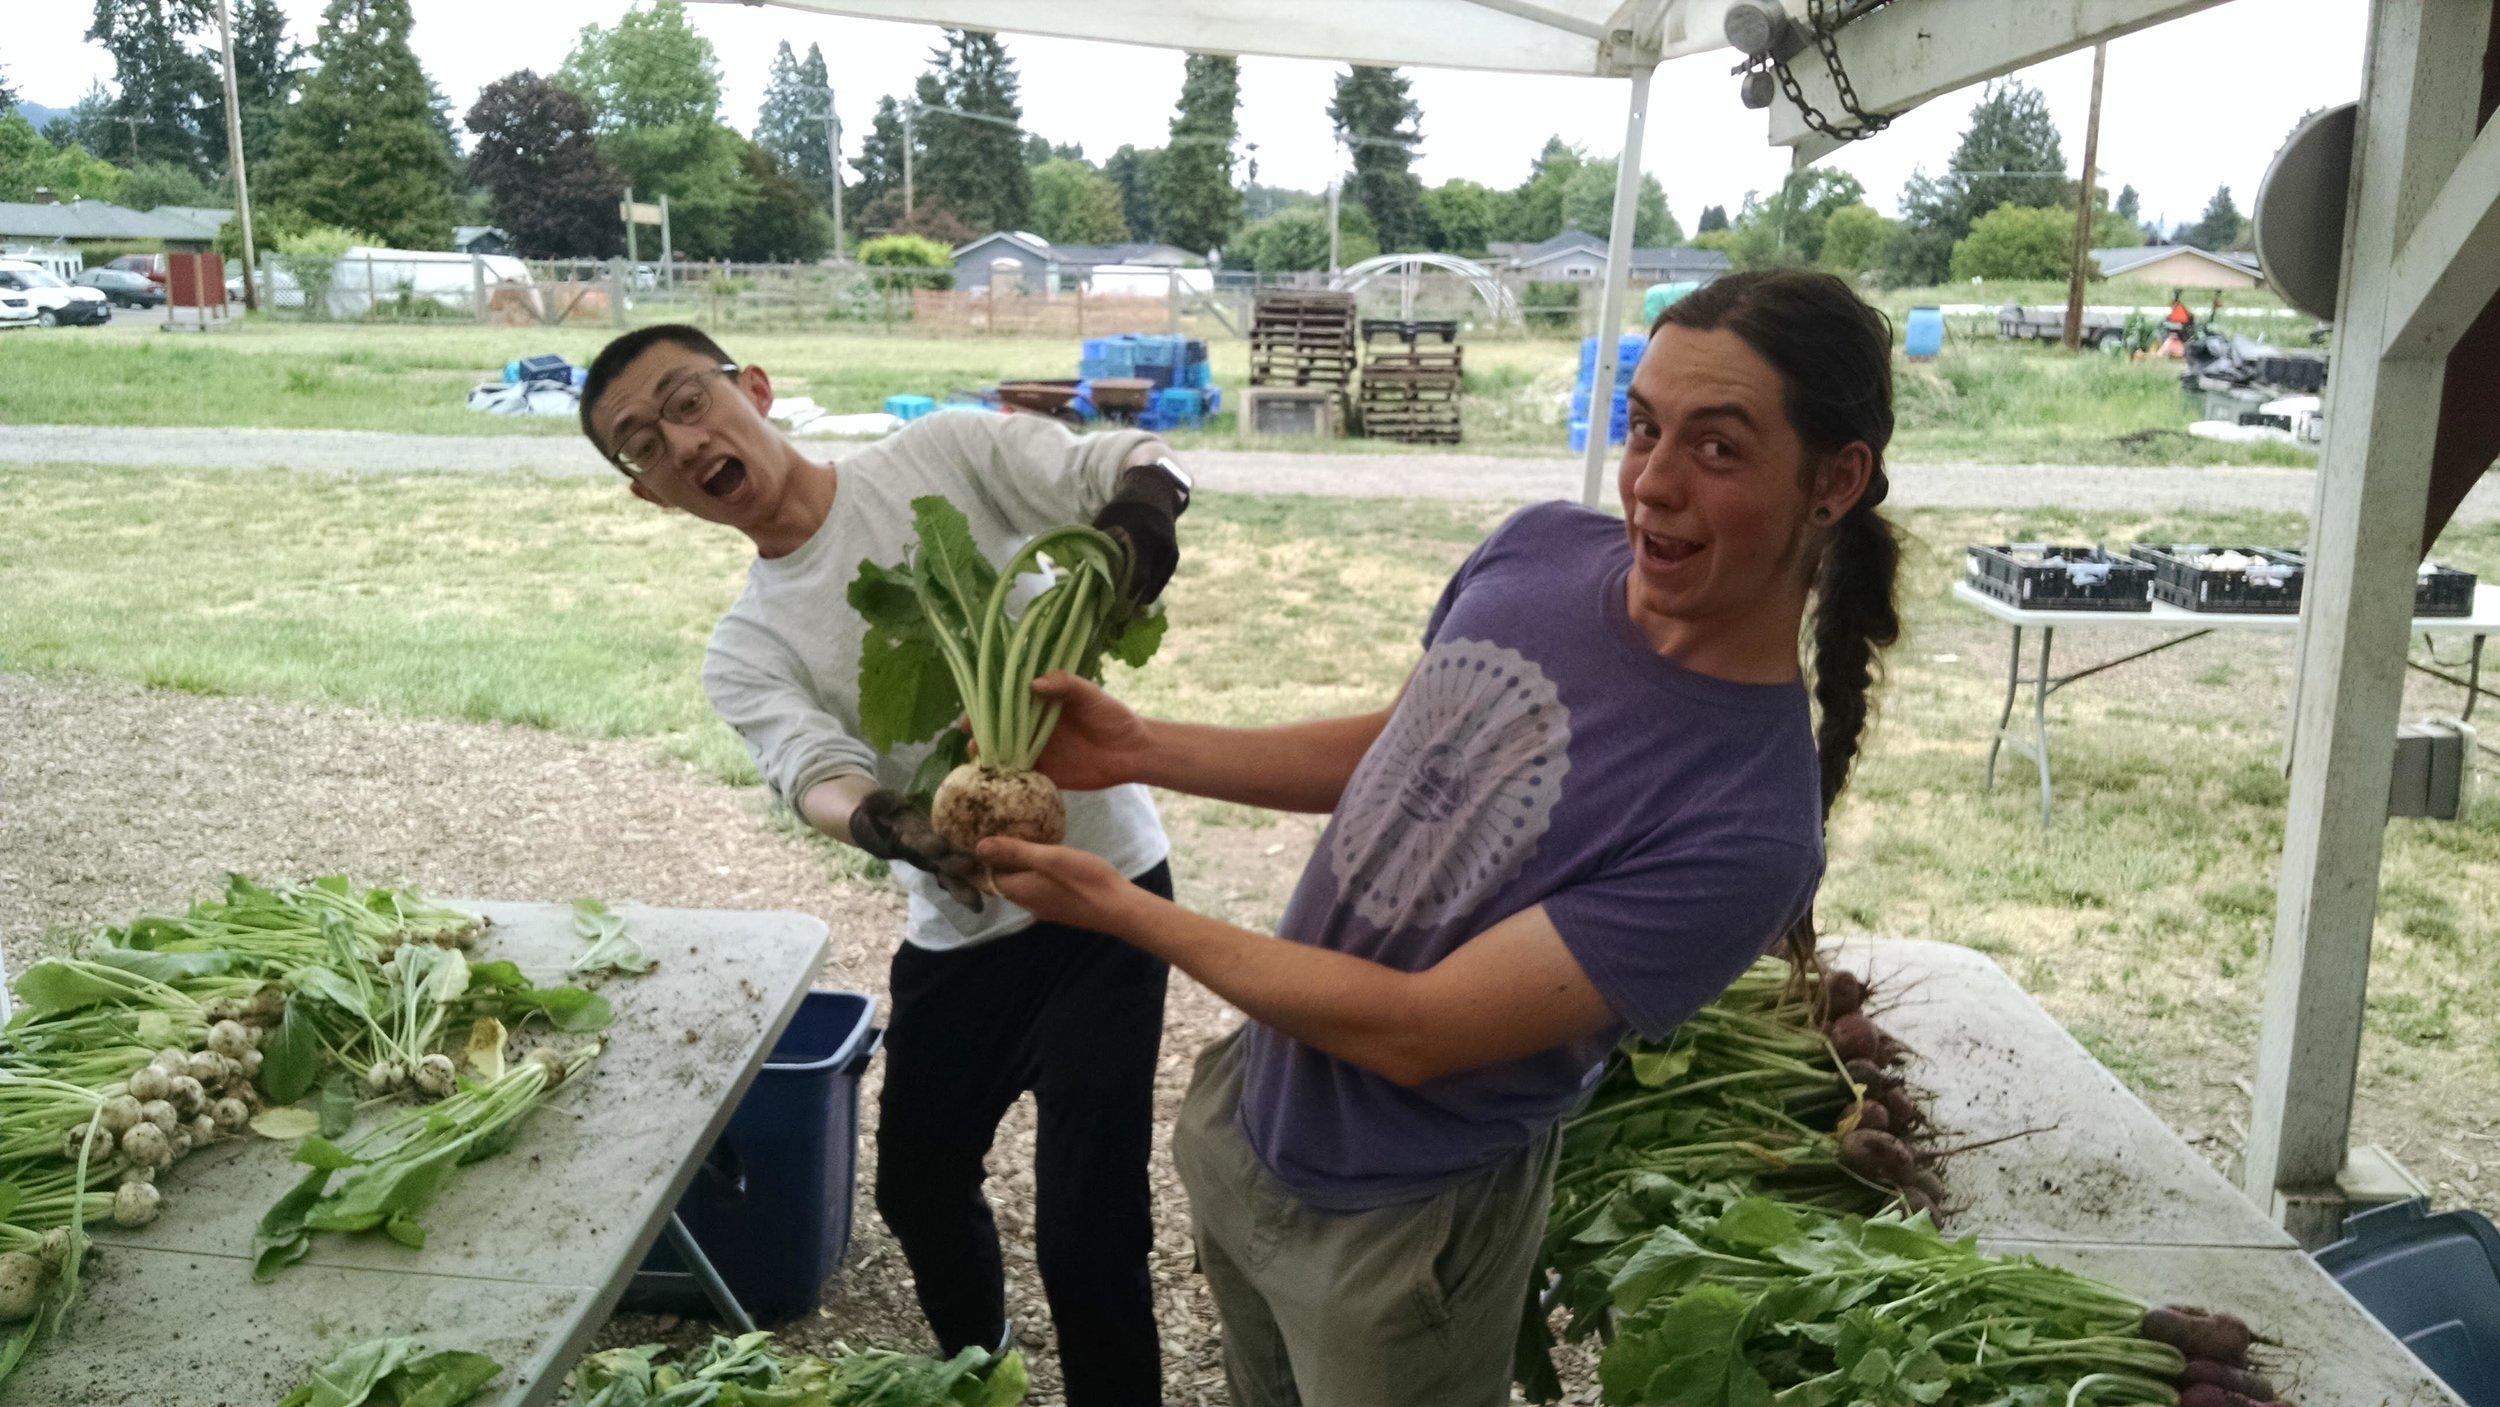 The biggest salad turnip